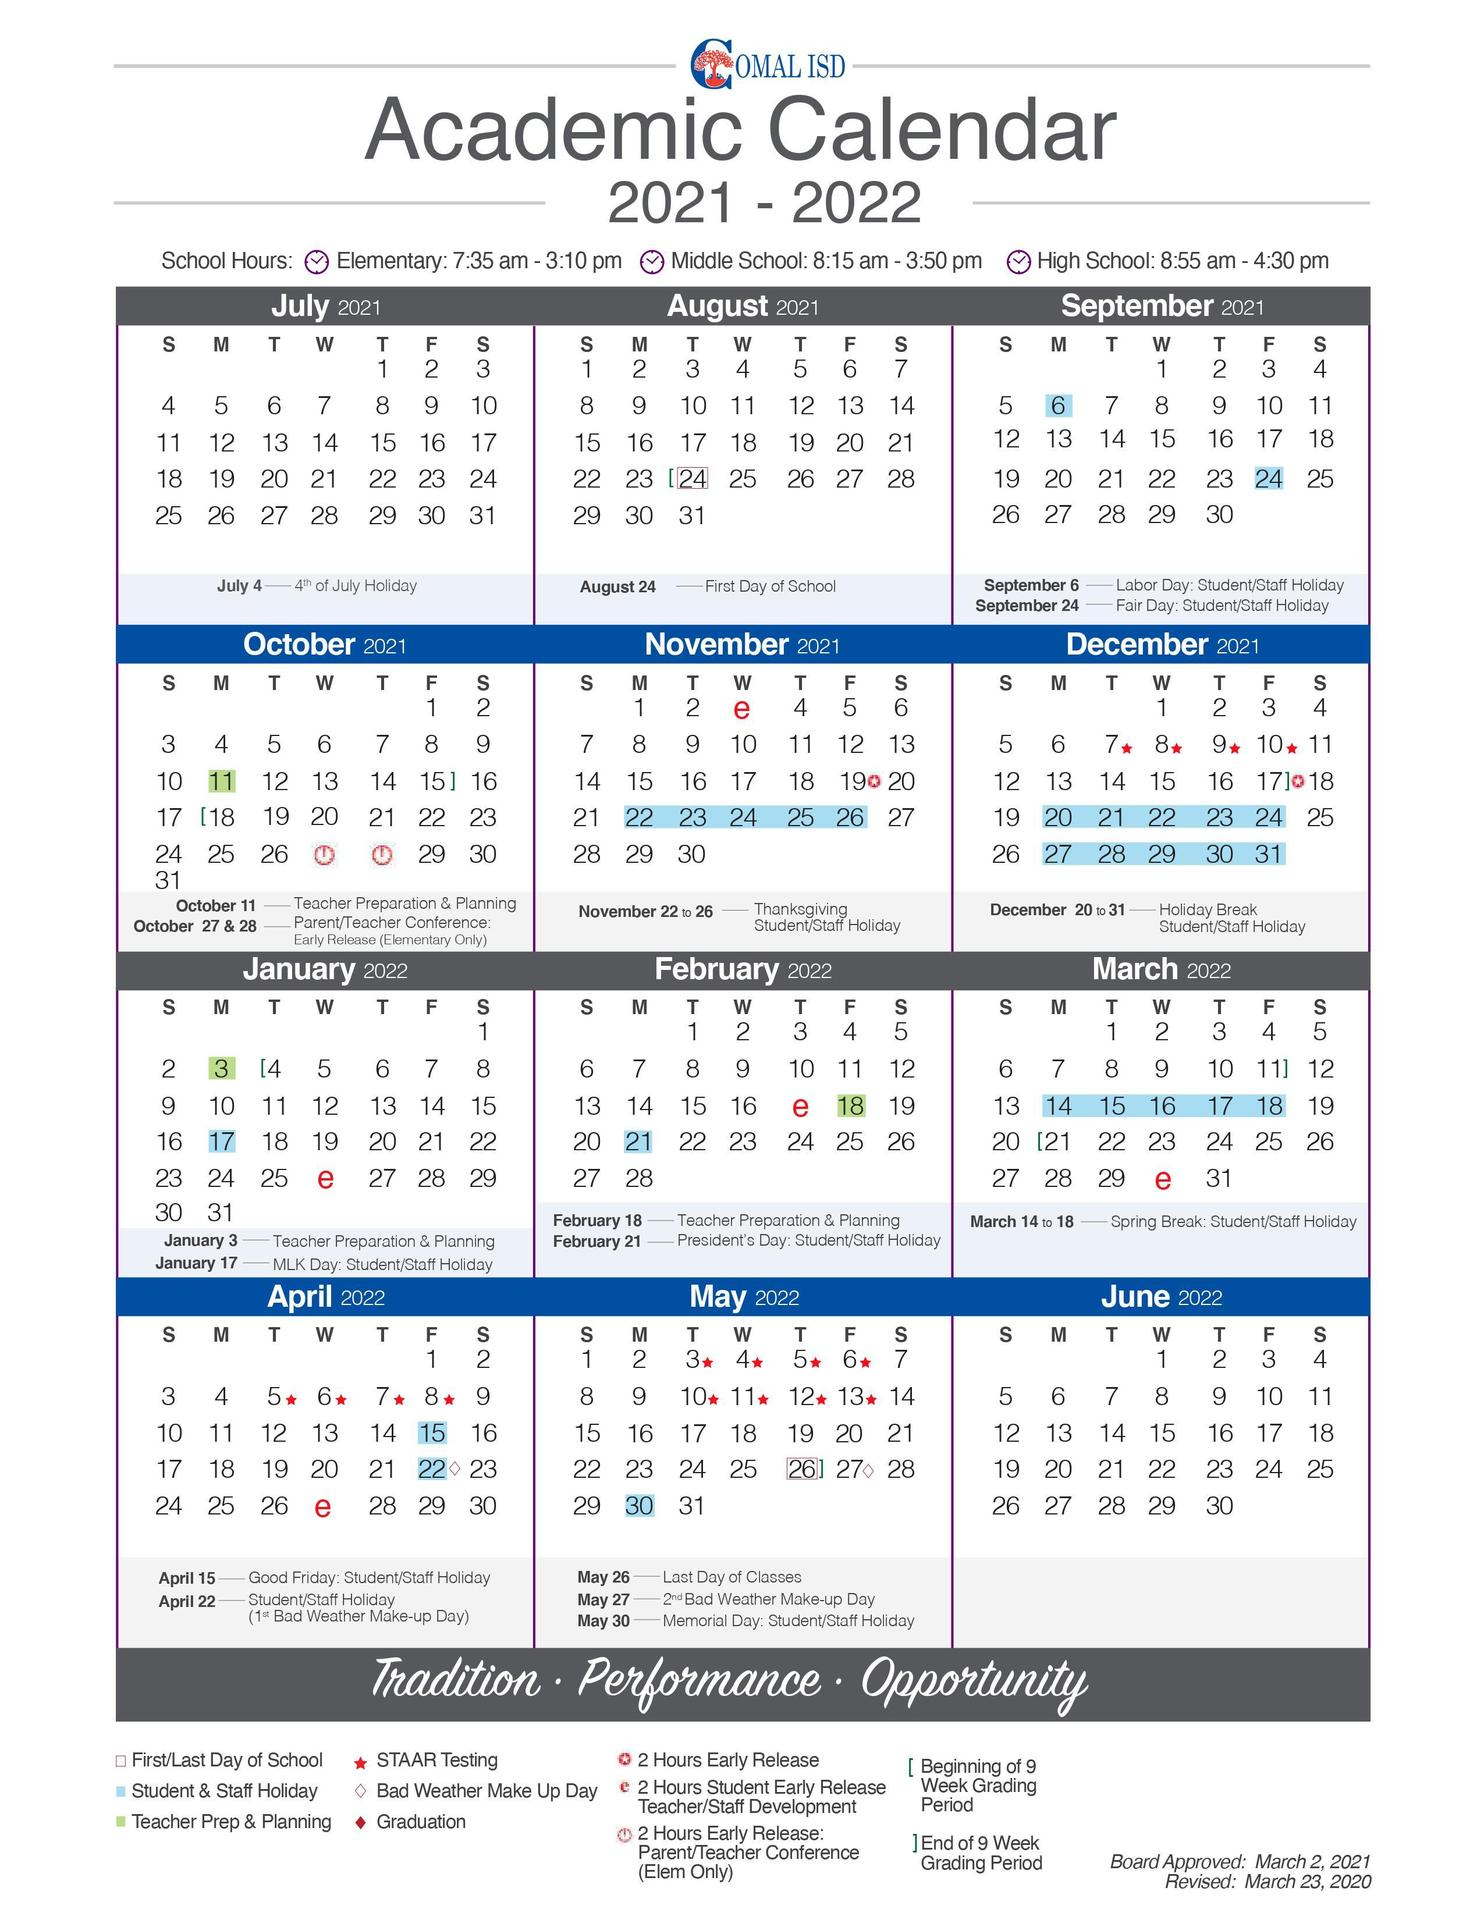 Academic Calendar 21-22